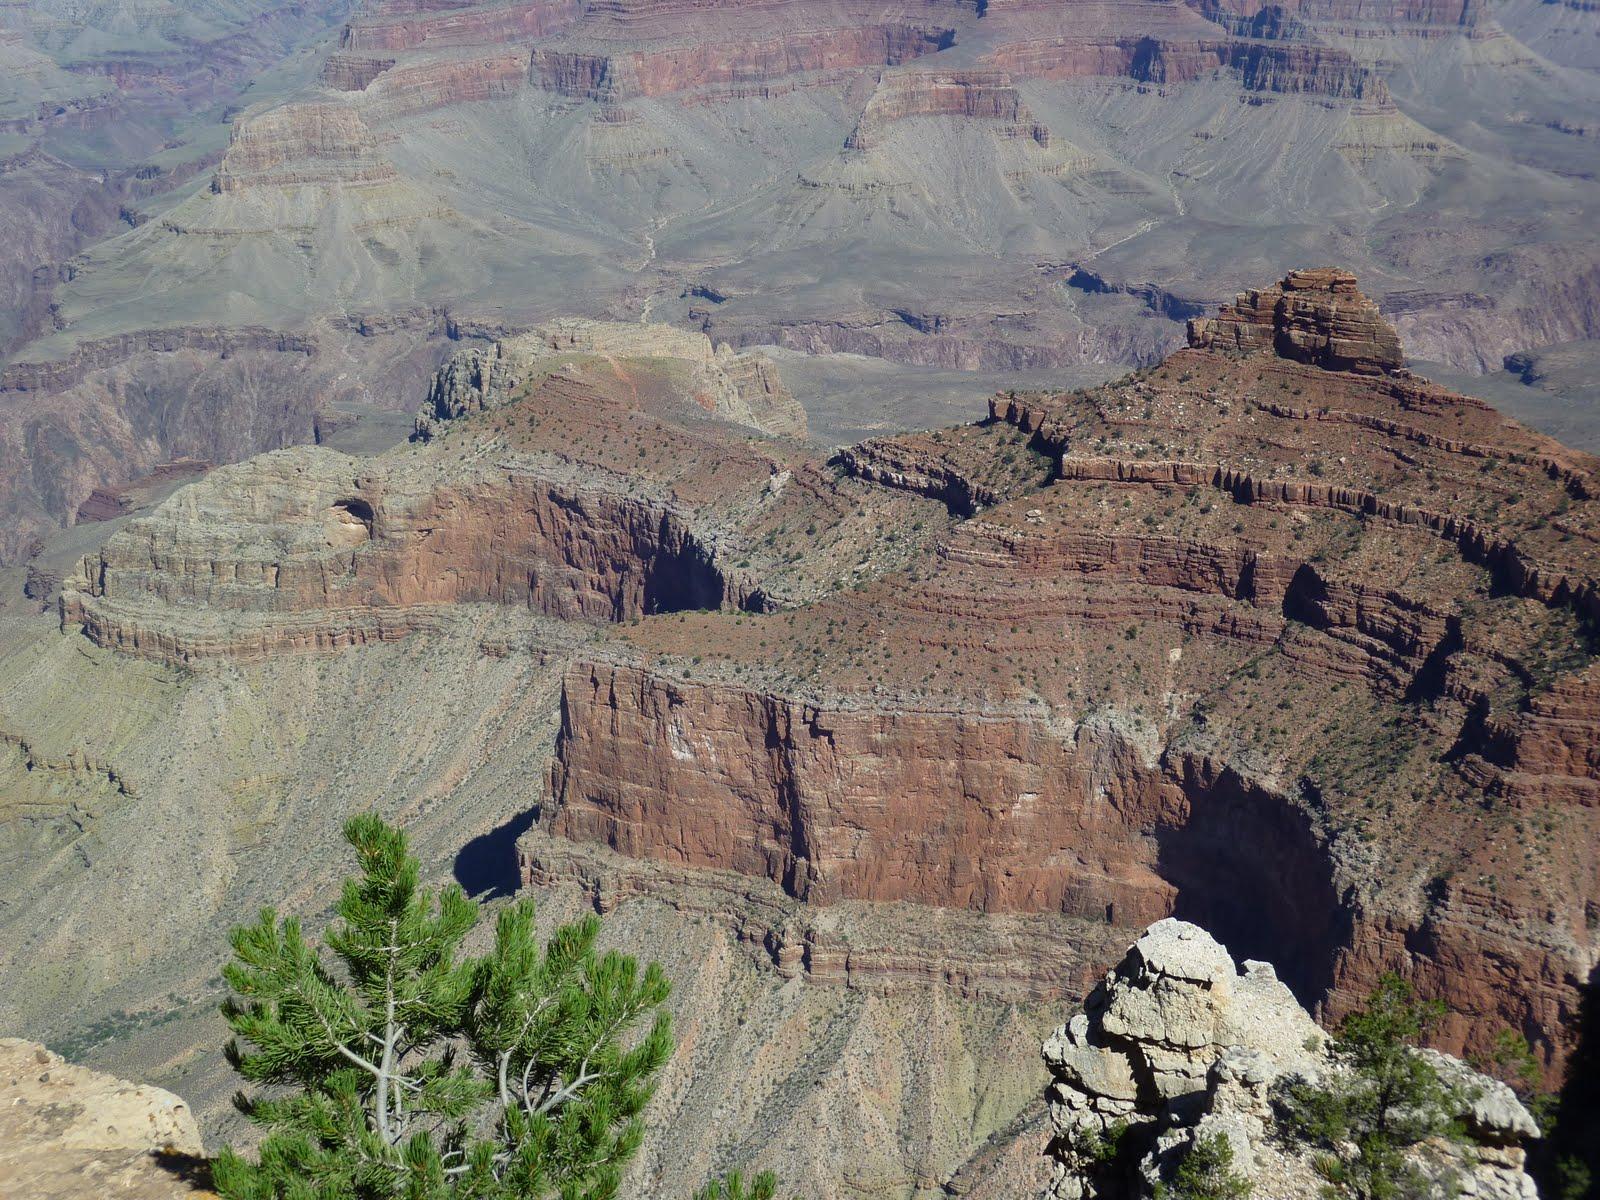 helicoter tour with Grand Canyon Helicopter Tours From Laughlin Nevada on Grand Canyon Helicopter Tours From Laughlin Nevada as well 20260150 furthermore Opera Binasinin Proje Uygulama Imzasi Atildi in addition En additionally 20259330.